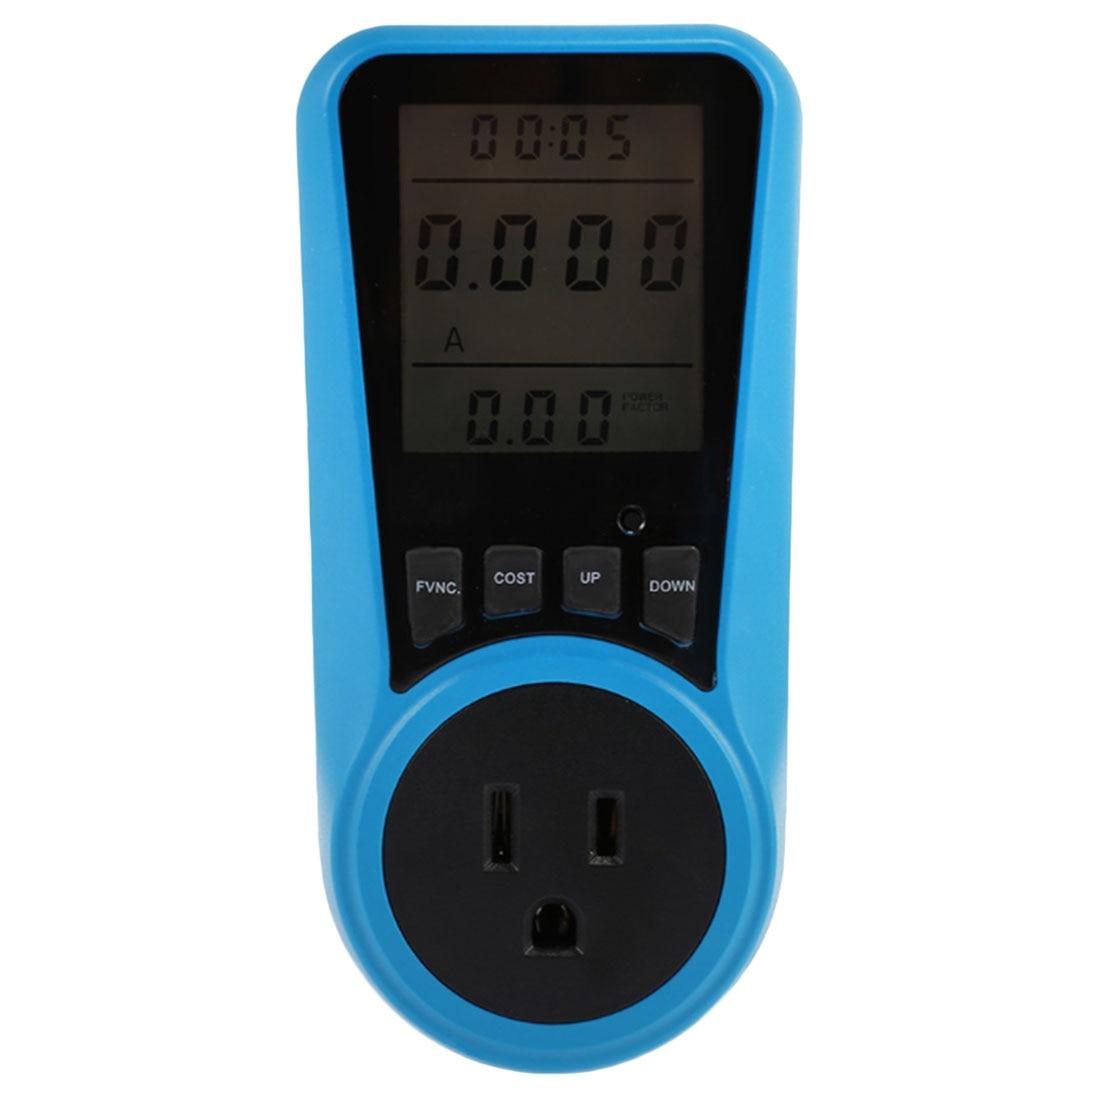 Plug In Energy Meter Watt Volt Voltage Electric Monitor Analyzer Power Fact JL